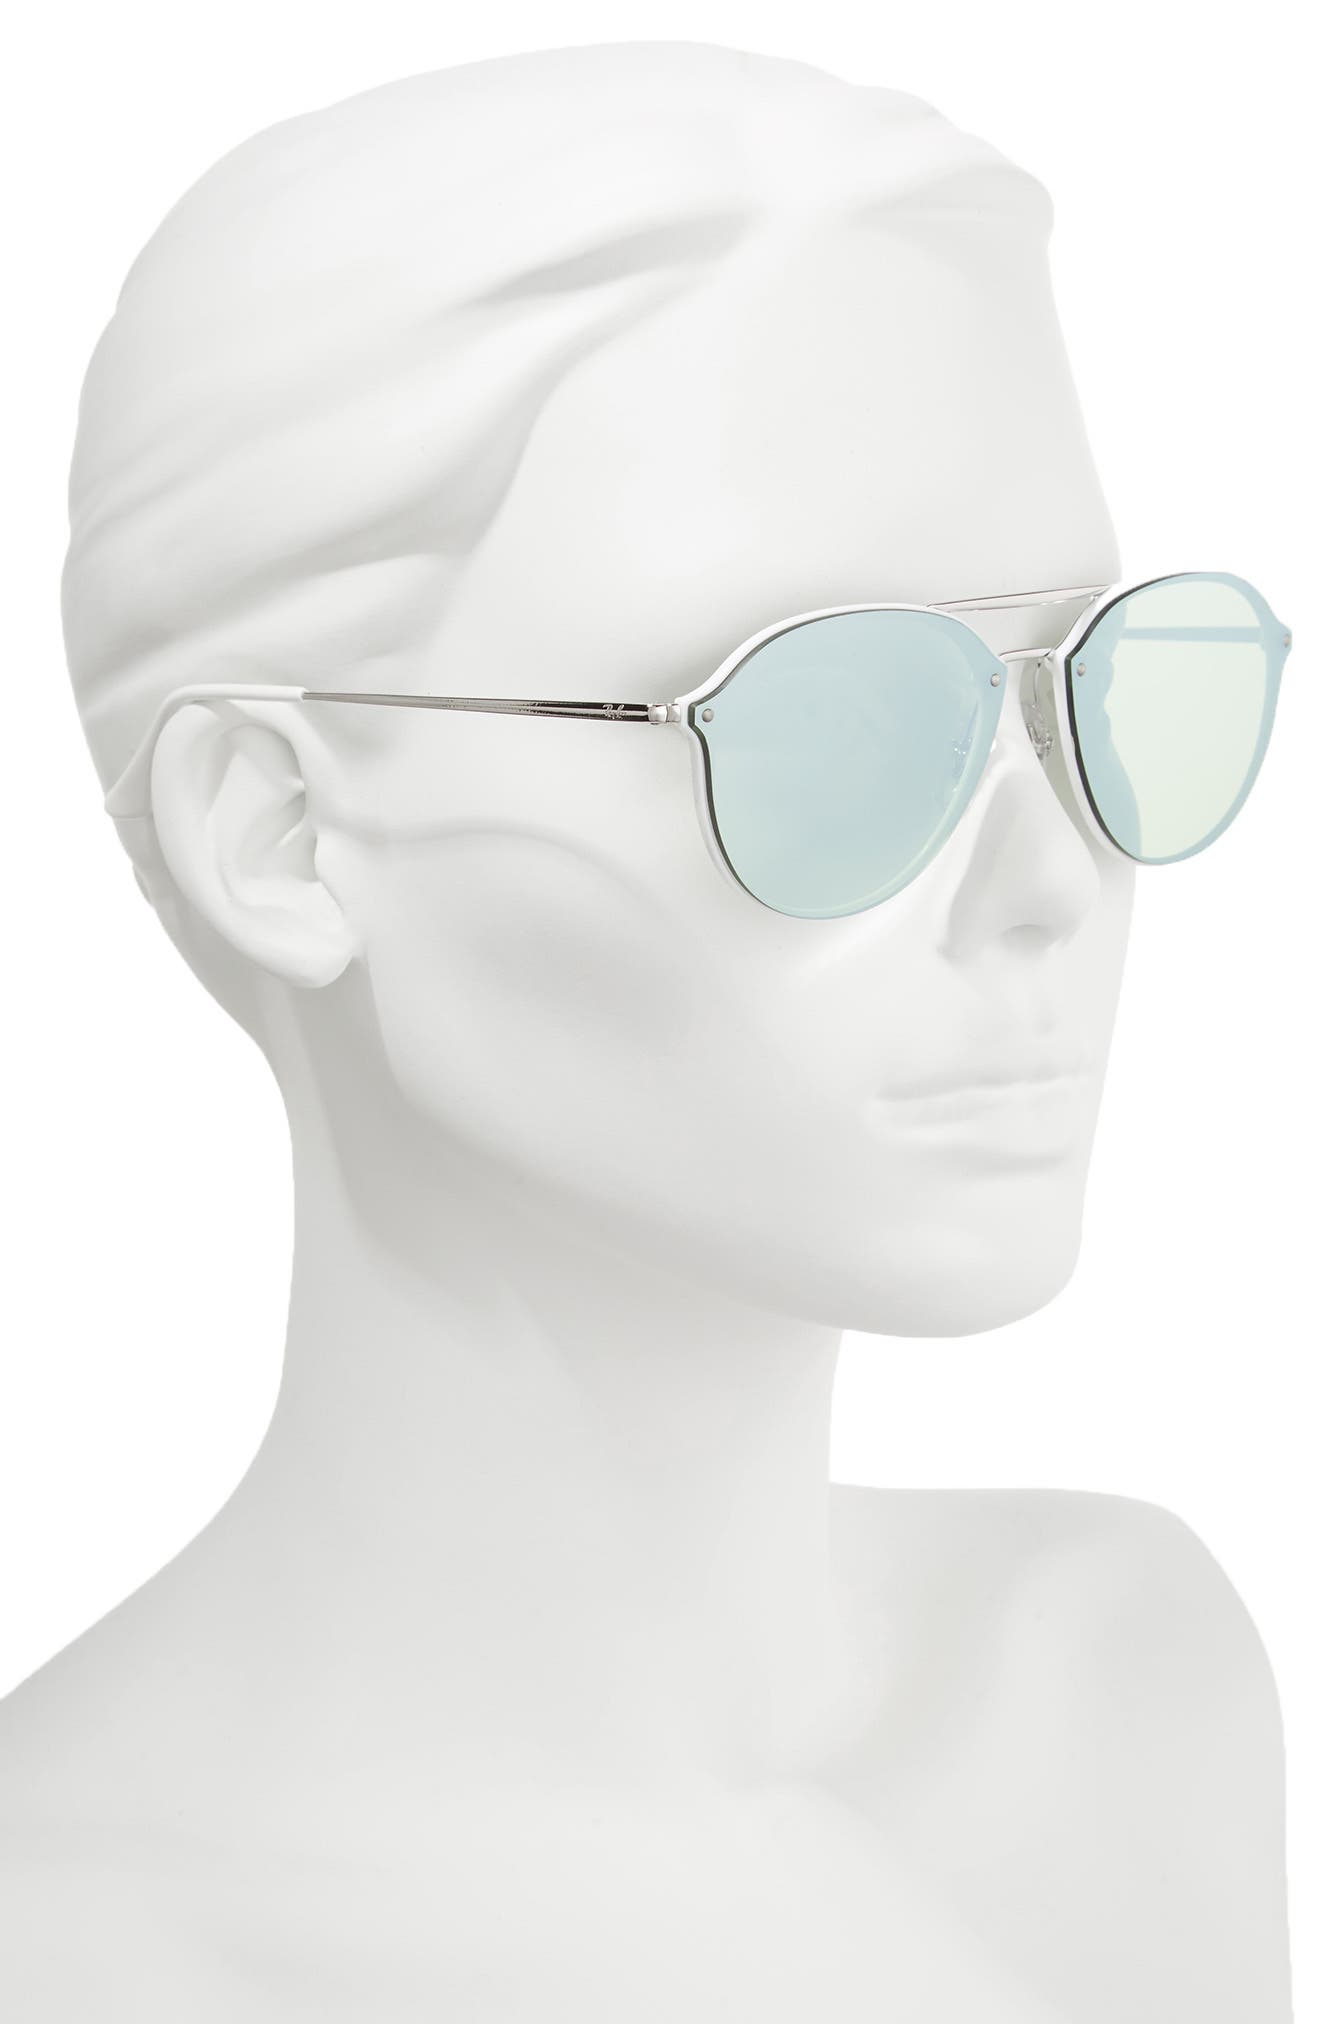 62mm Mirrored Lens Aviator Sunglasses,                             Alternate thumbnail 2, color,                             100